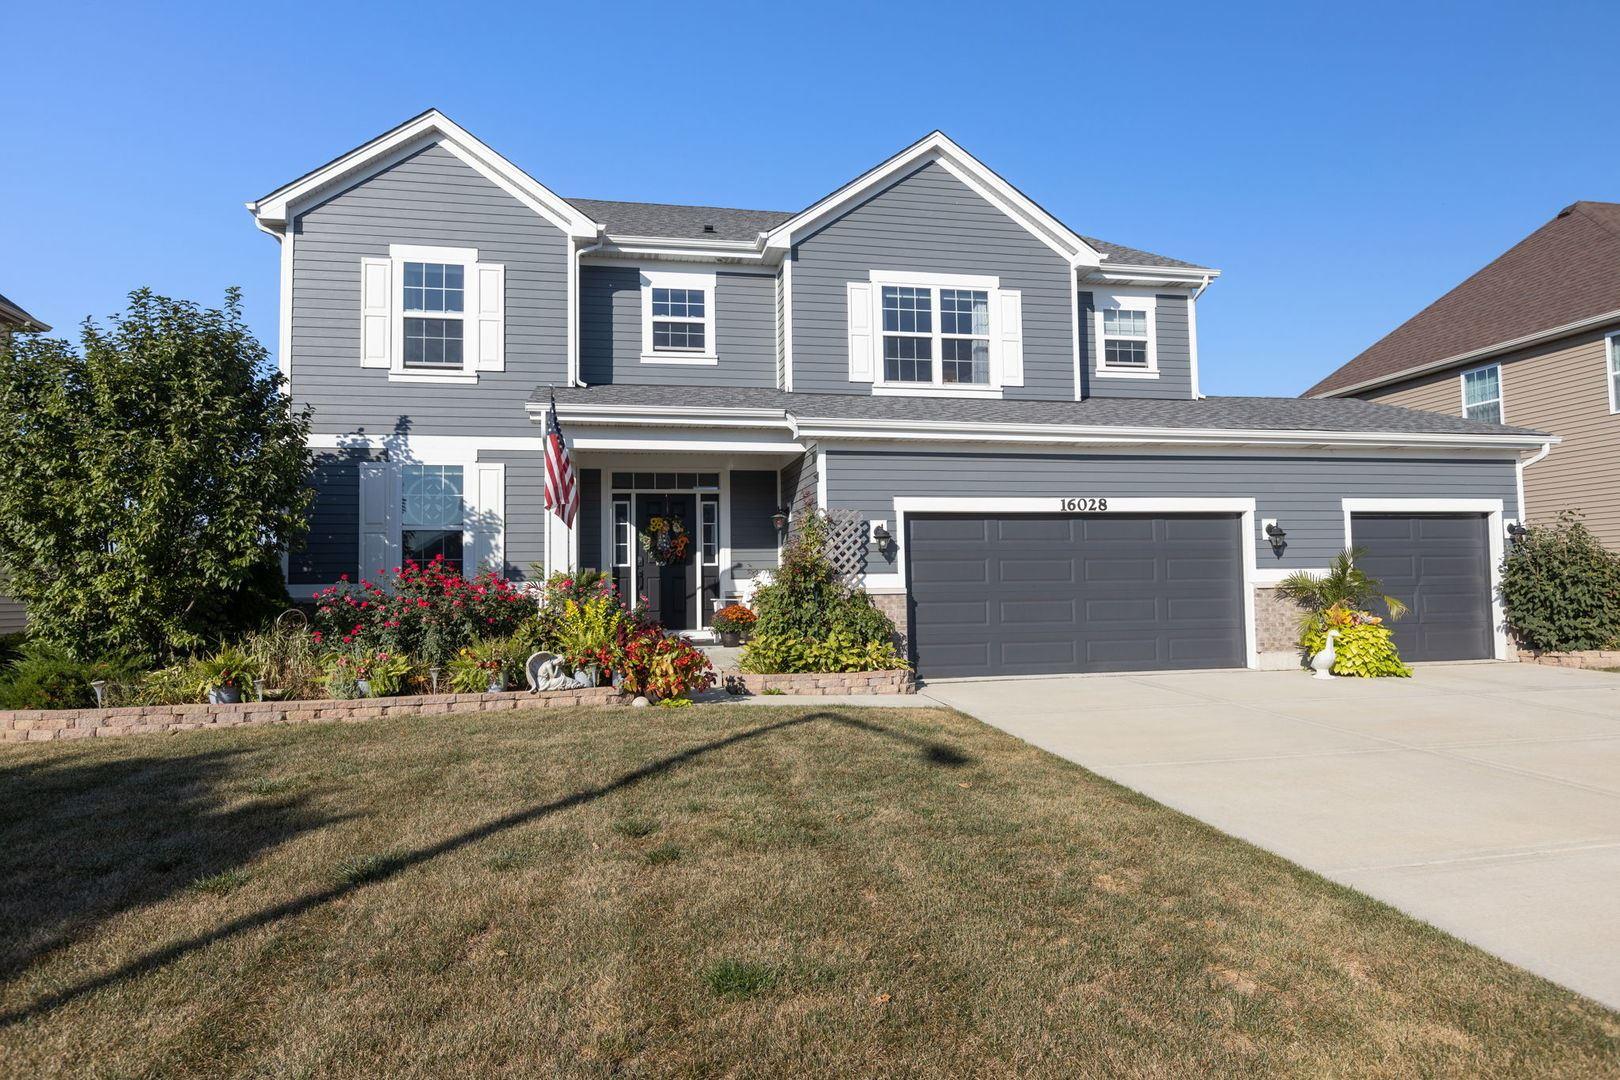 16028 S Selfridge Circle, Plainfield, IL 60586 - #: 11221883